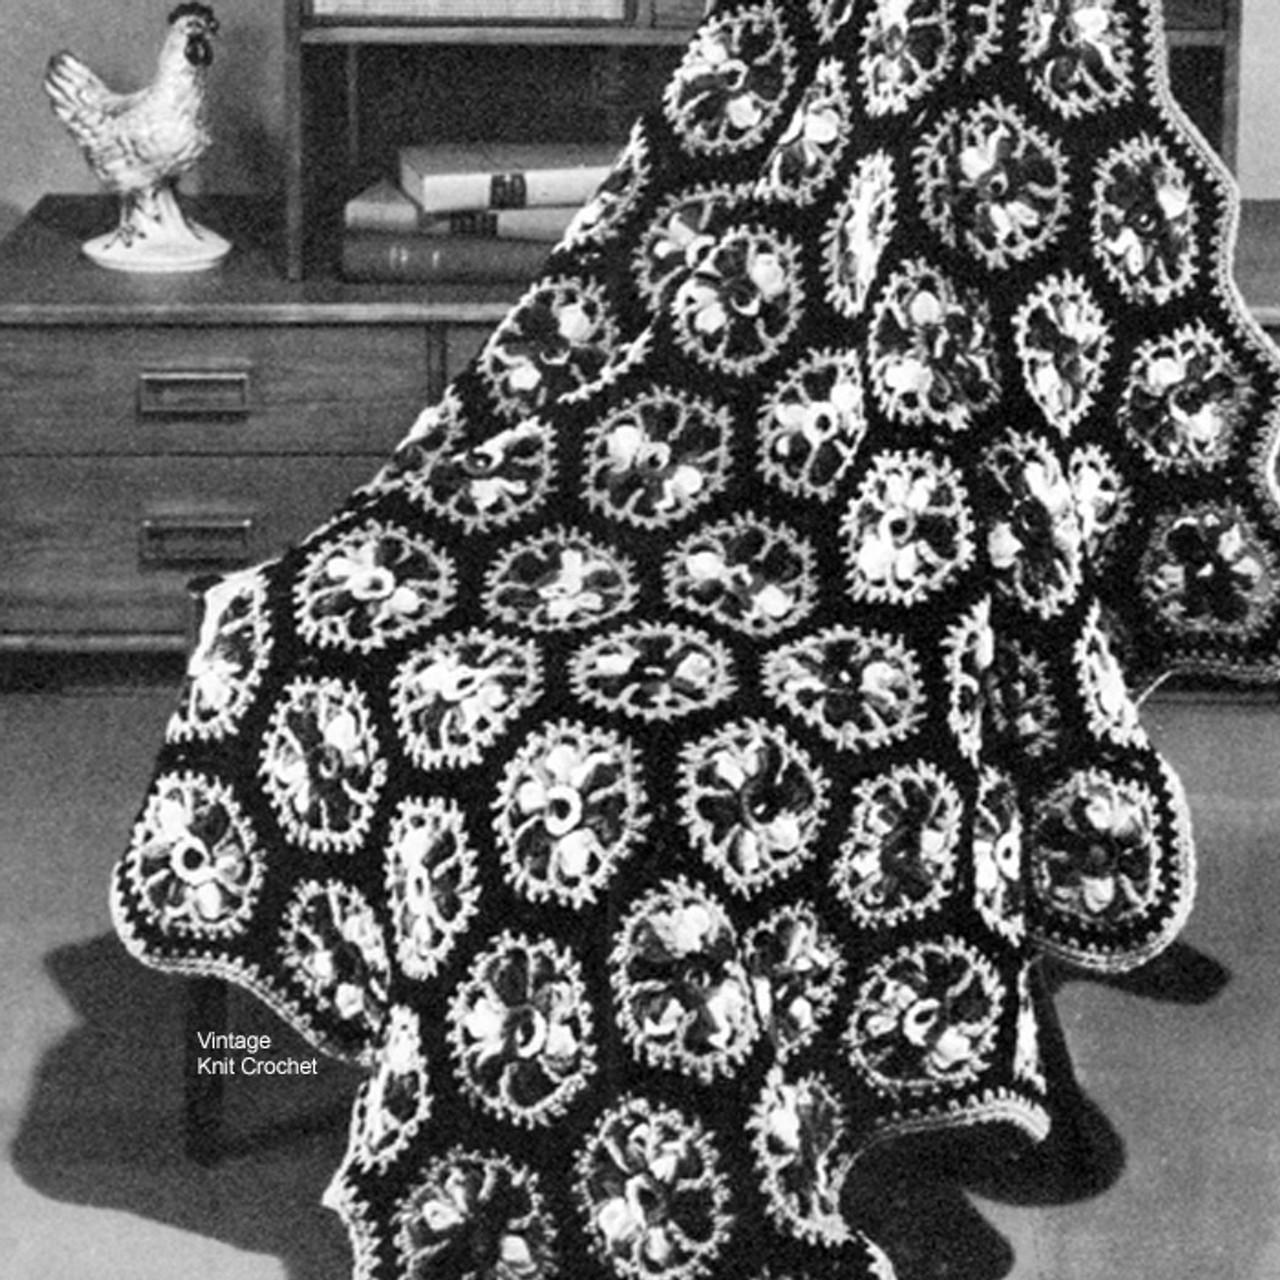 Vintage Crochet Afghan Pattern in Variegated Knitting Worsted